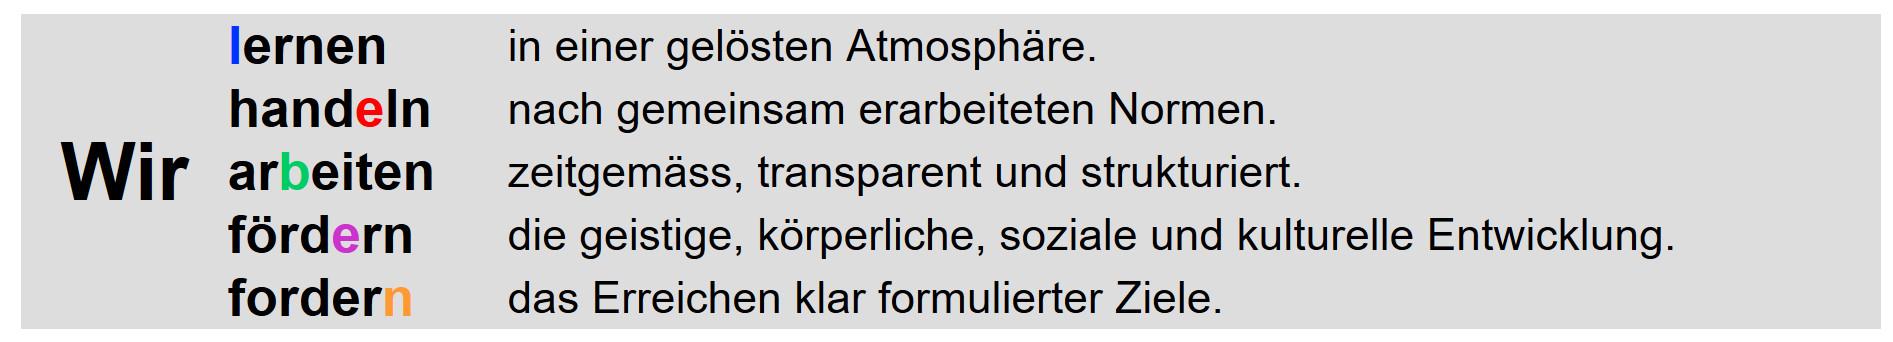 Das Leitbild des OSZ Täuffelen